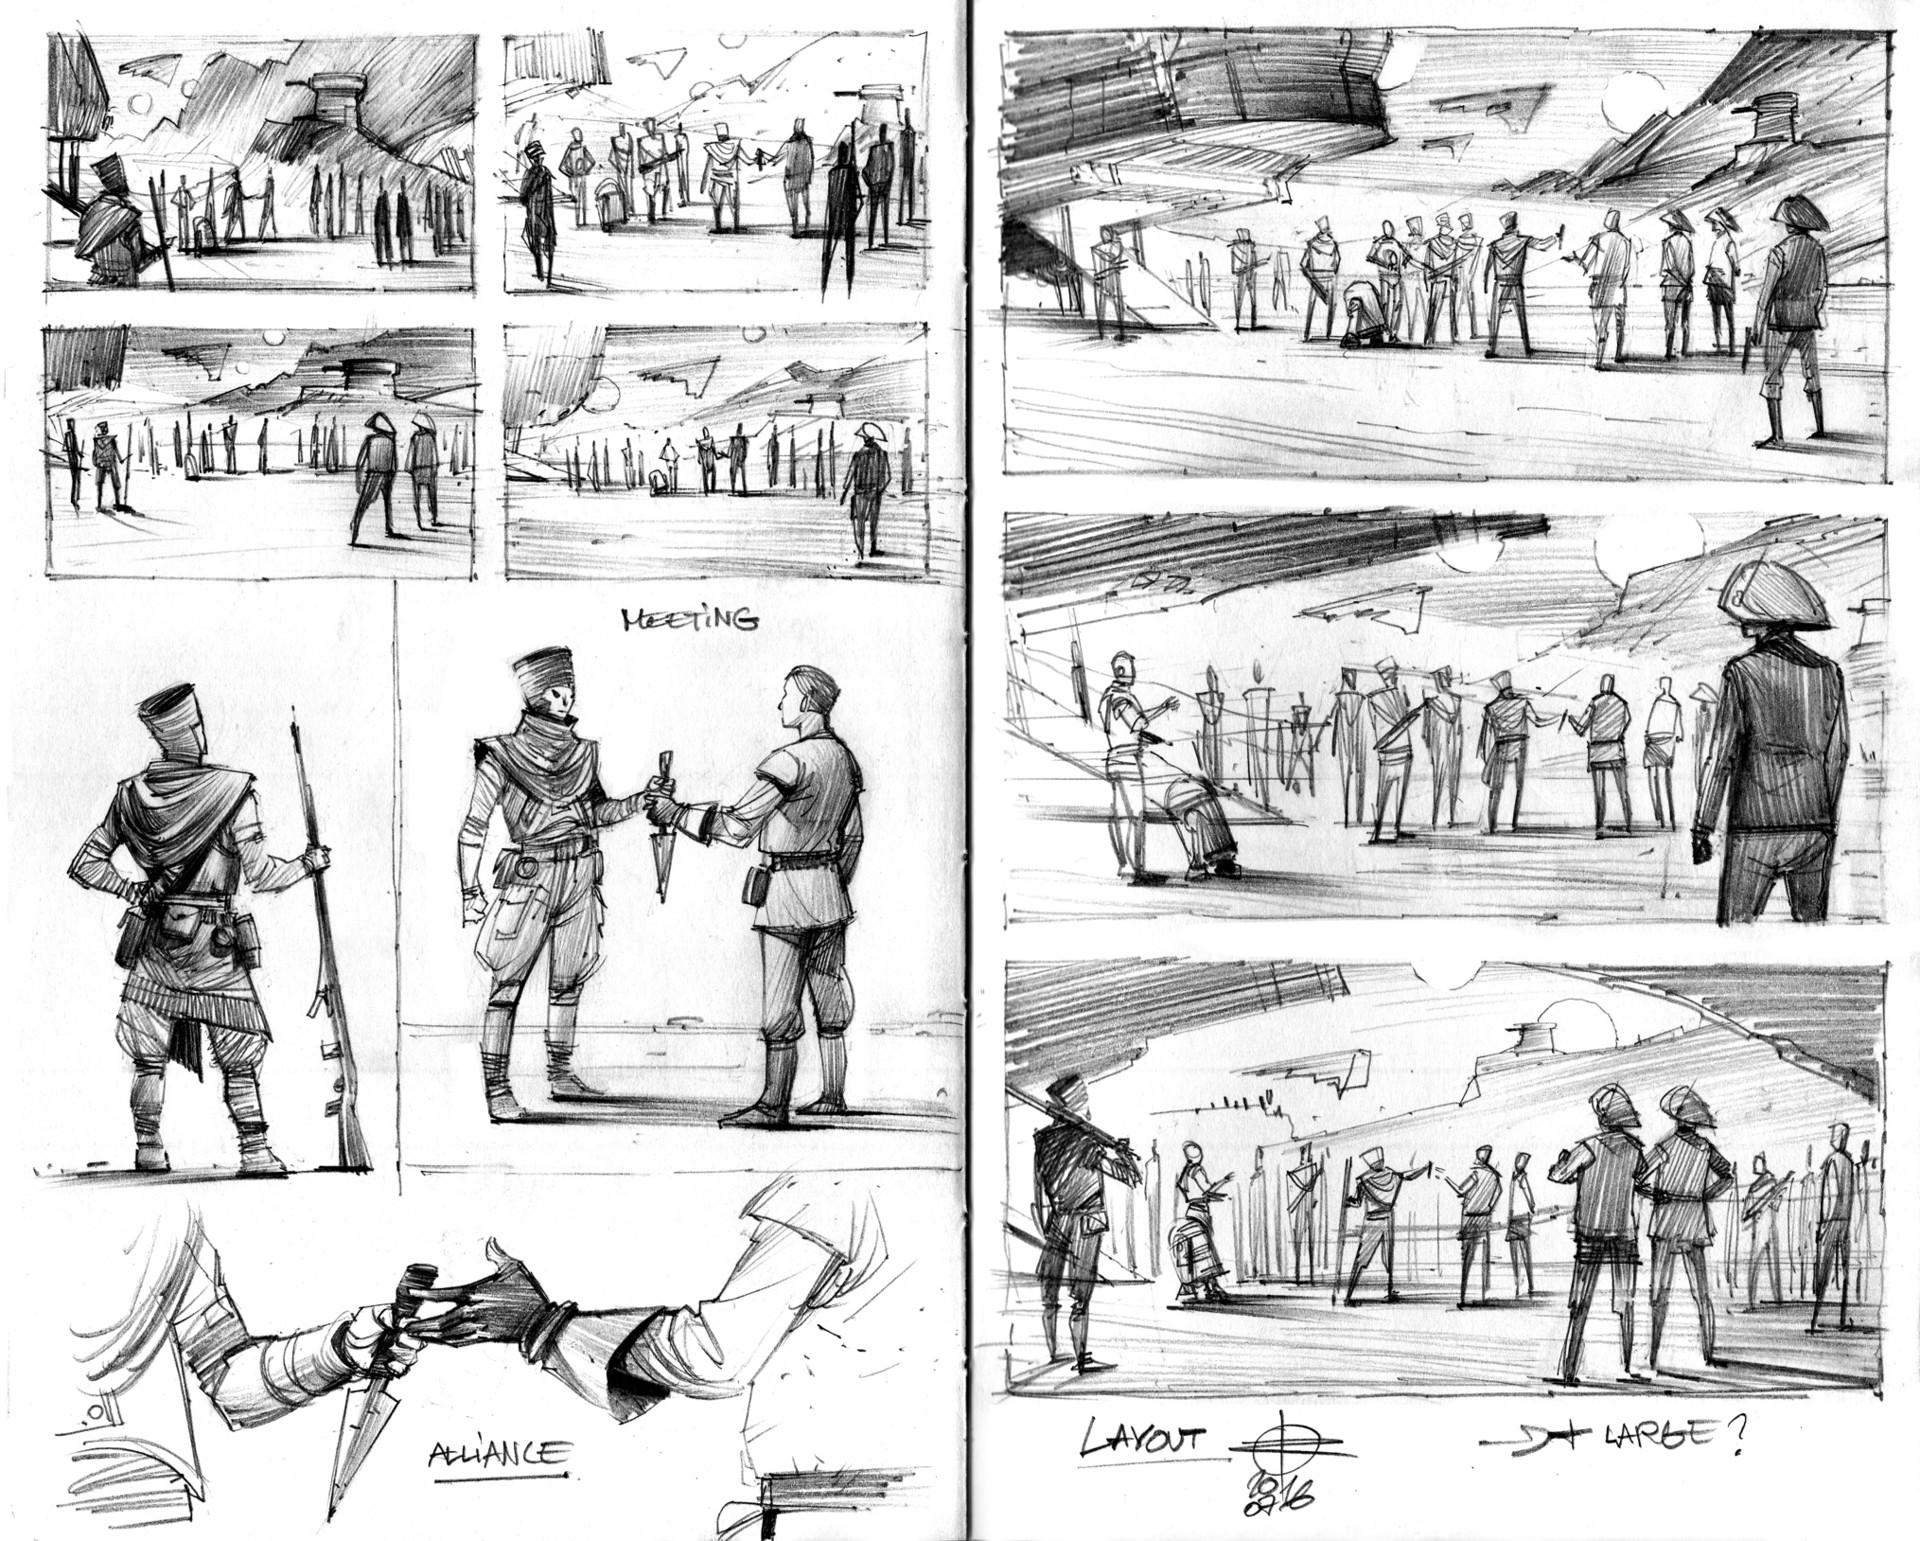 Renaud roche part03 sketches03b